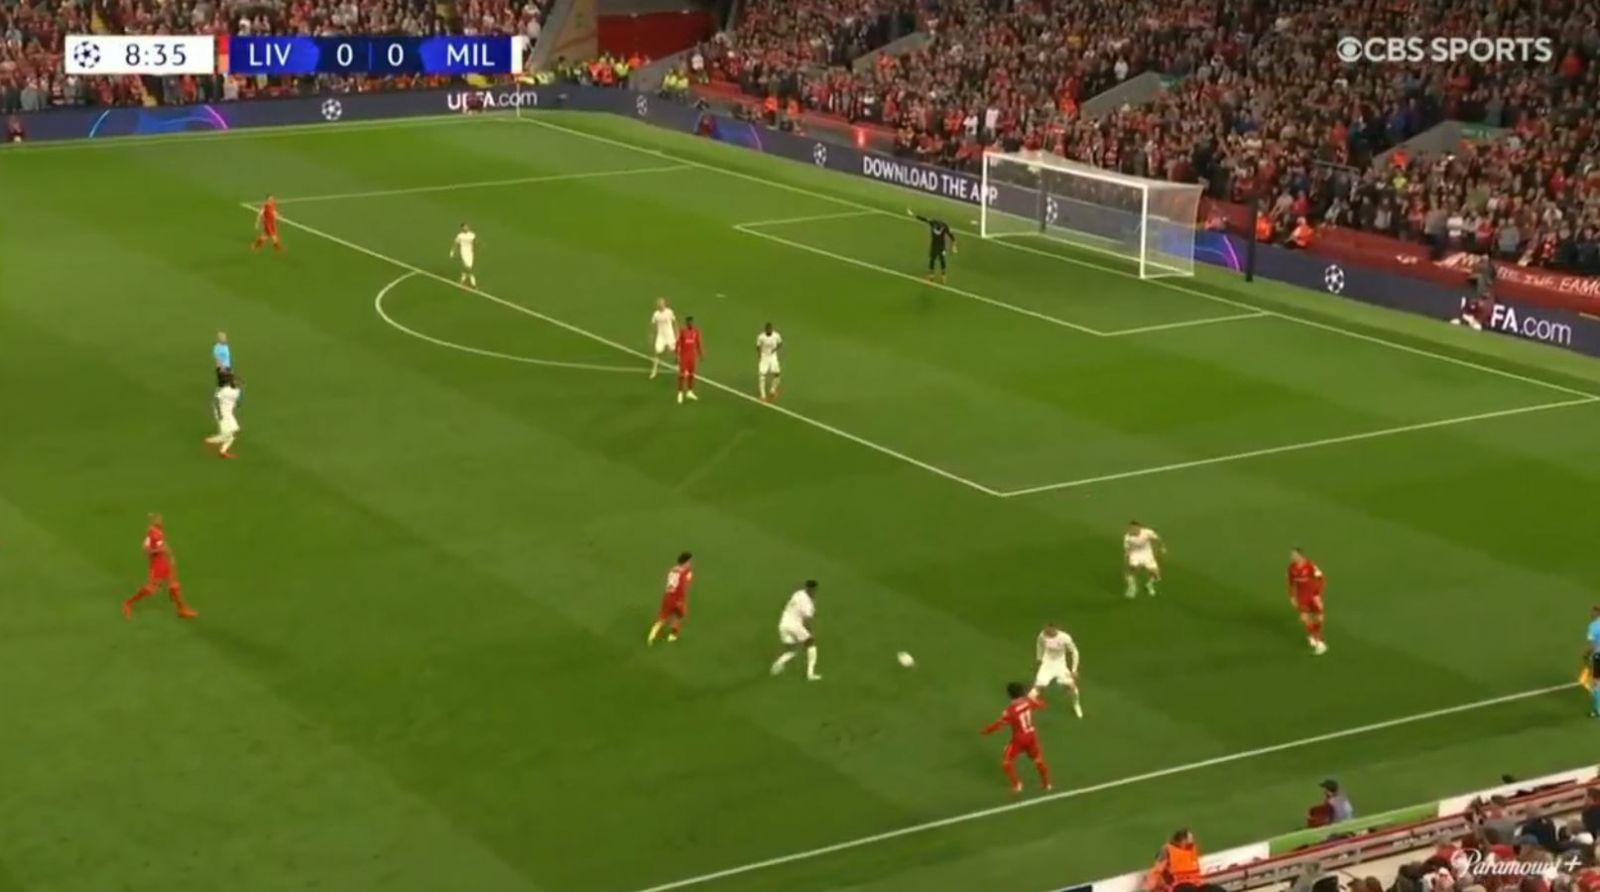 Liverpool 3-2 AC Milan (2021.09.15) Watch Full Goals Highlight Extended